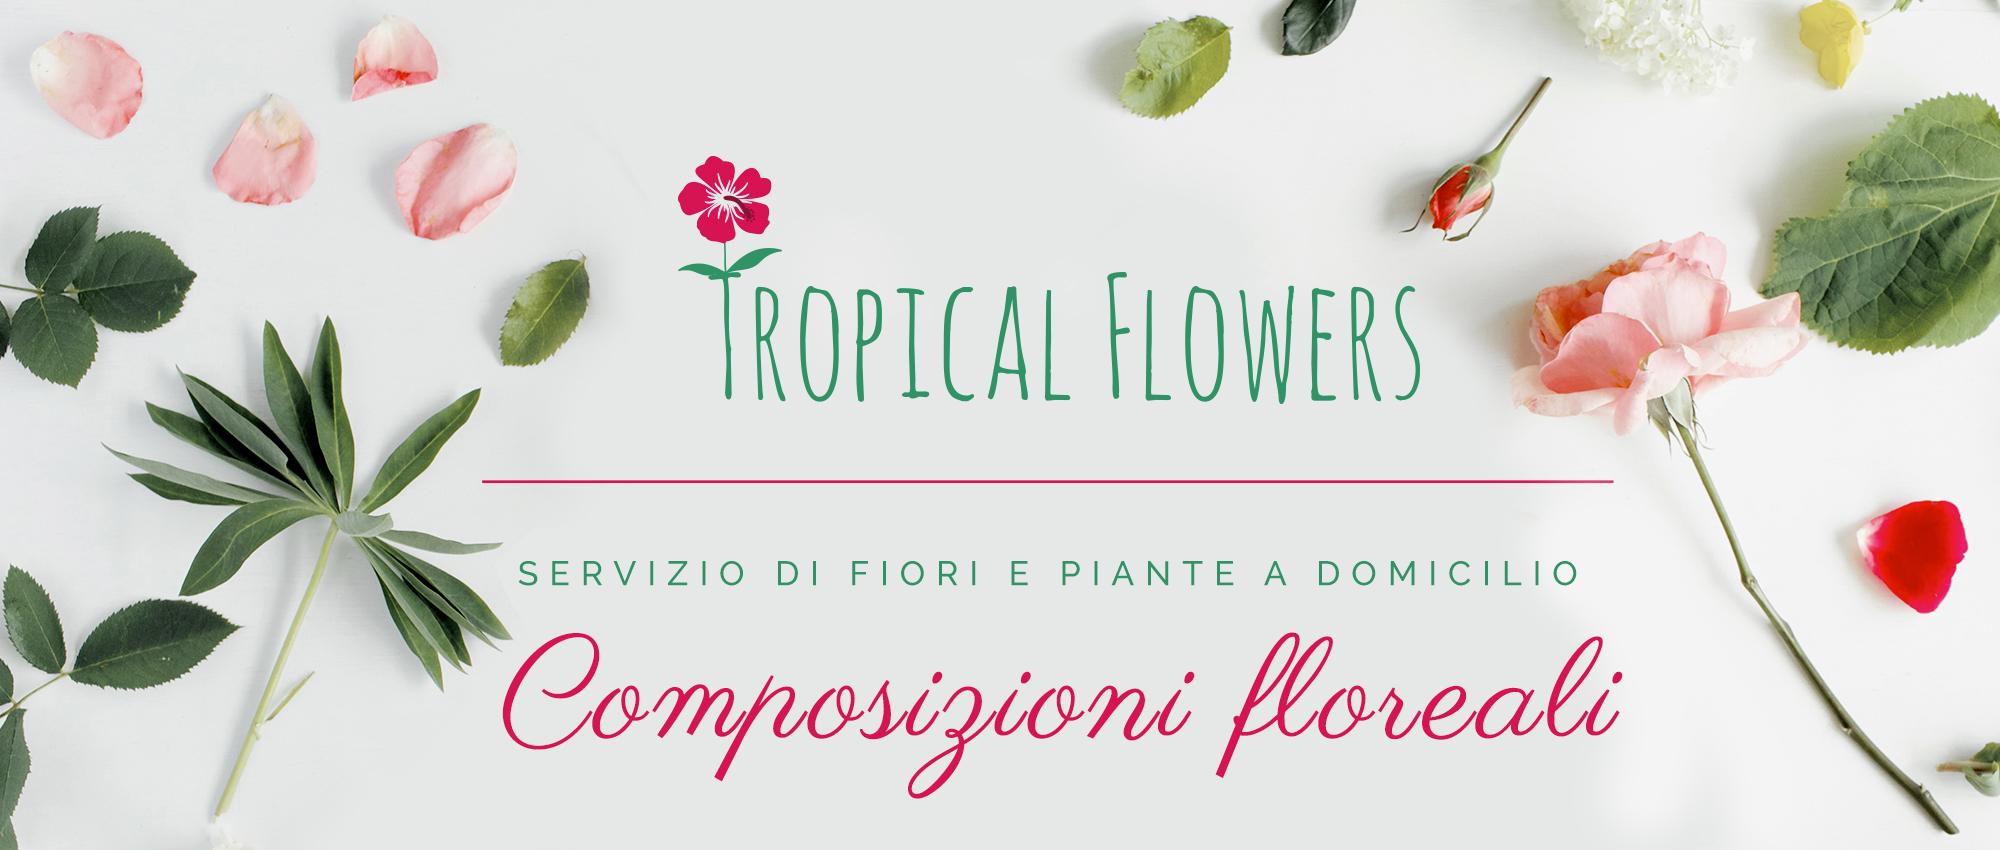 Tropical Flower Saronno